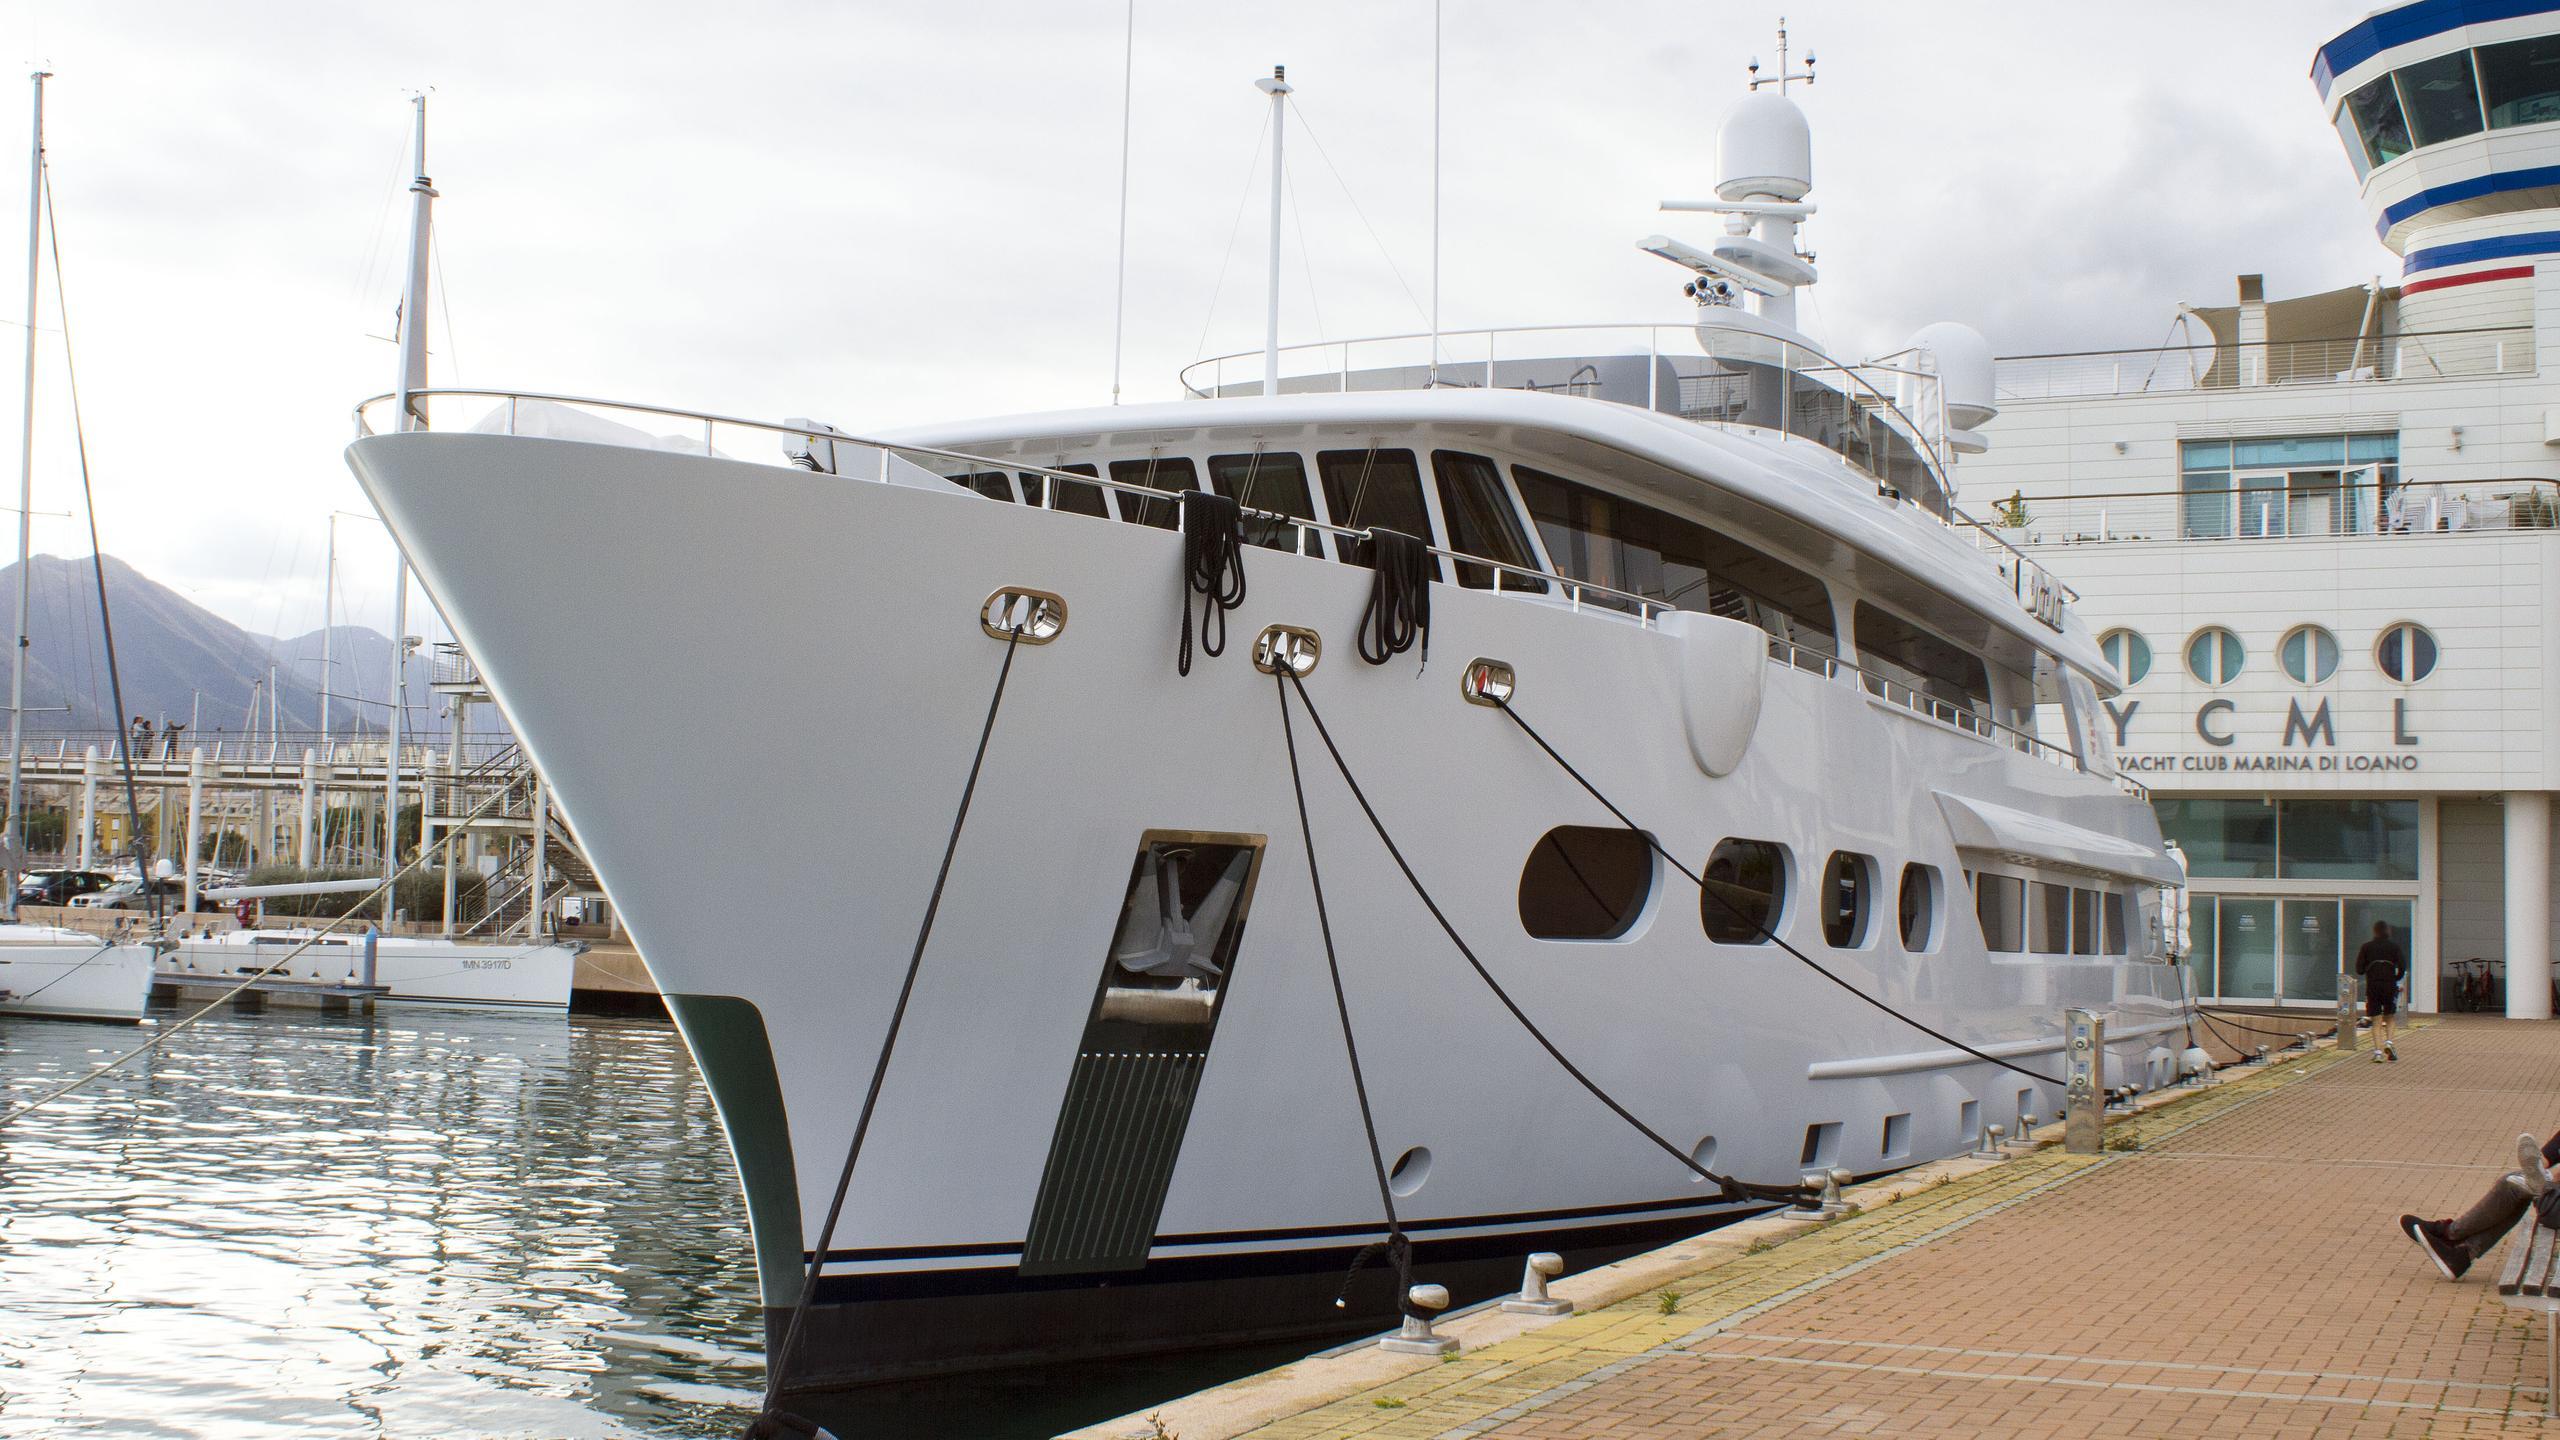 baron-trenck-explorer-yacht-eurocraft-2011-43m-moored-half-profile